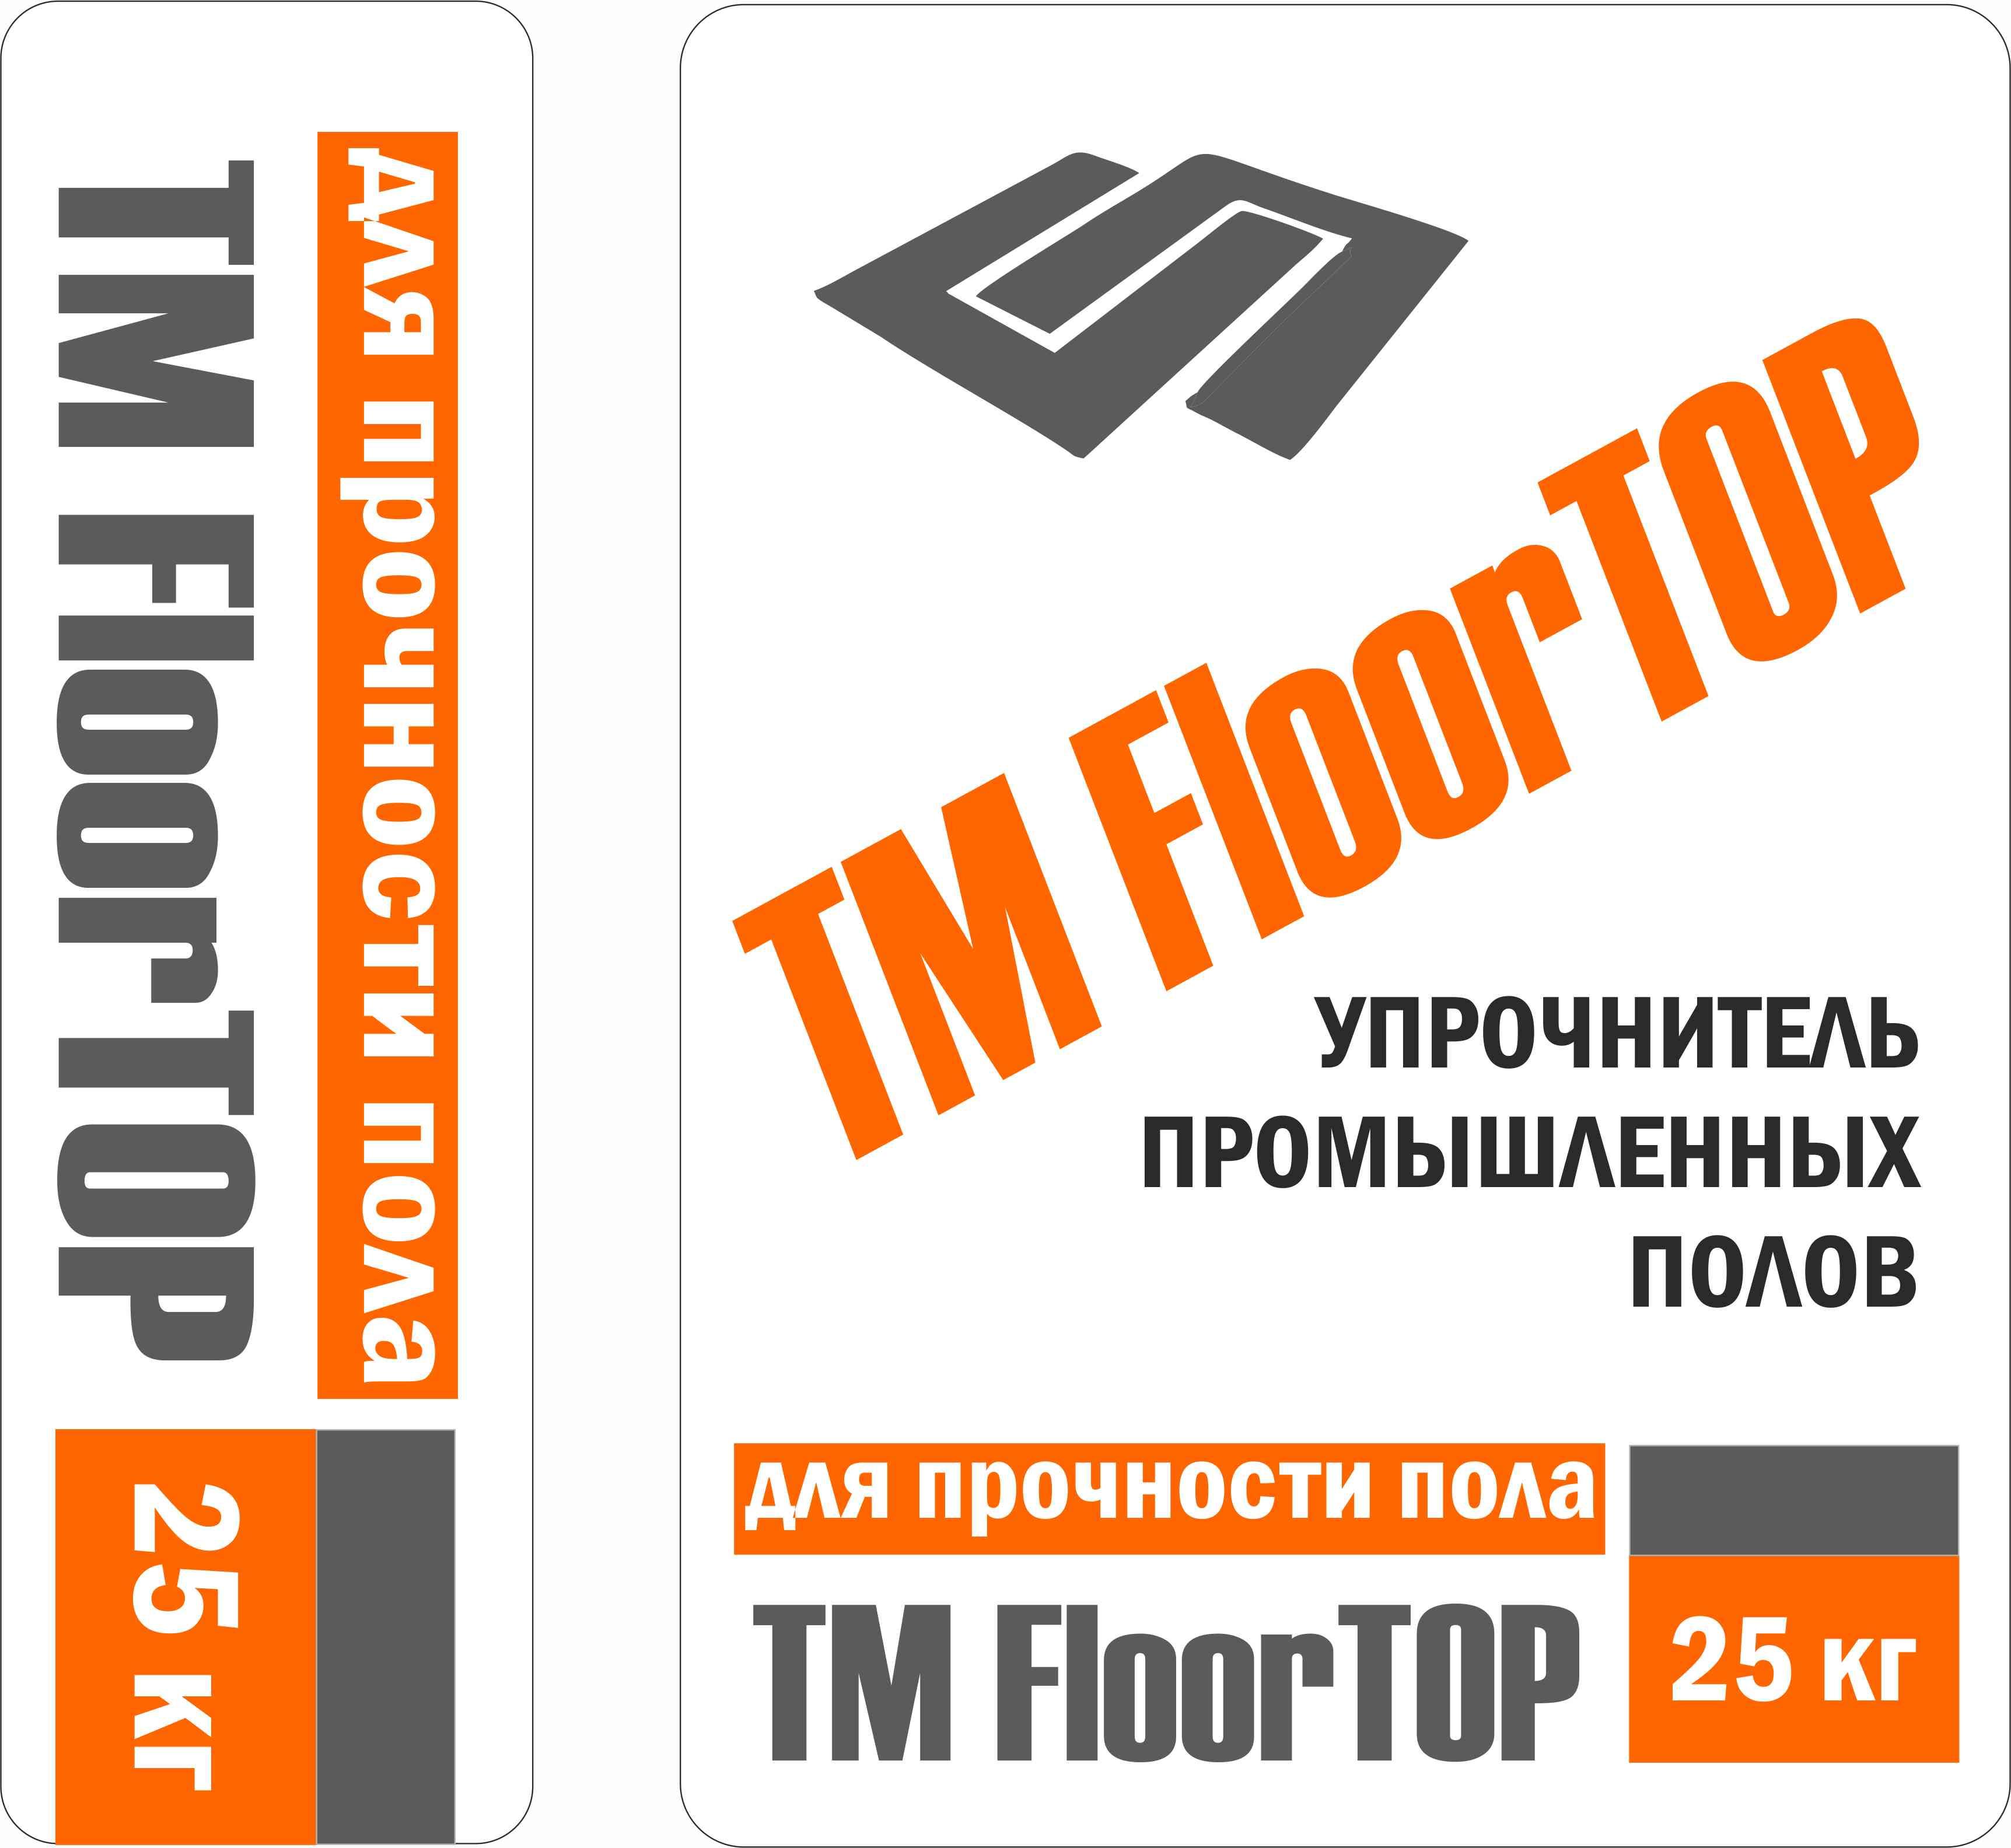 Разработка логотипа и дизайна на упаковку для сухой смеси фото f_1665d26b963f01f3.jpg